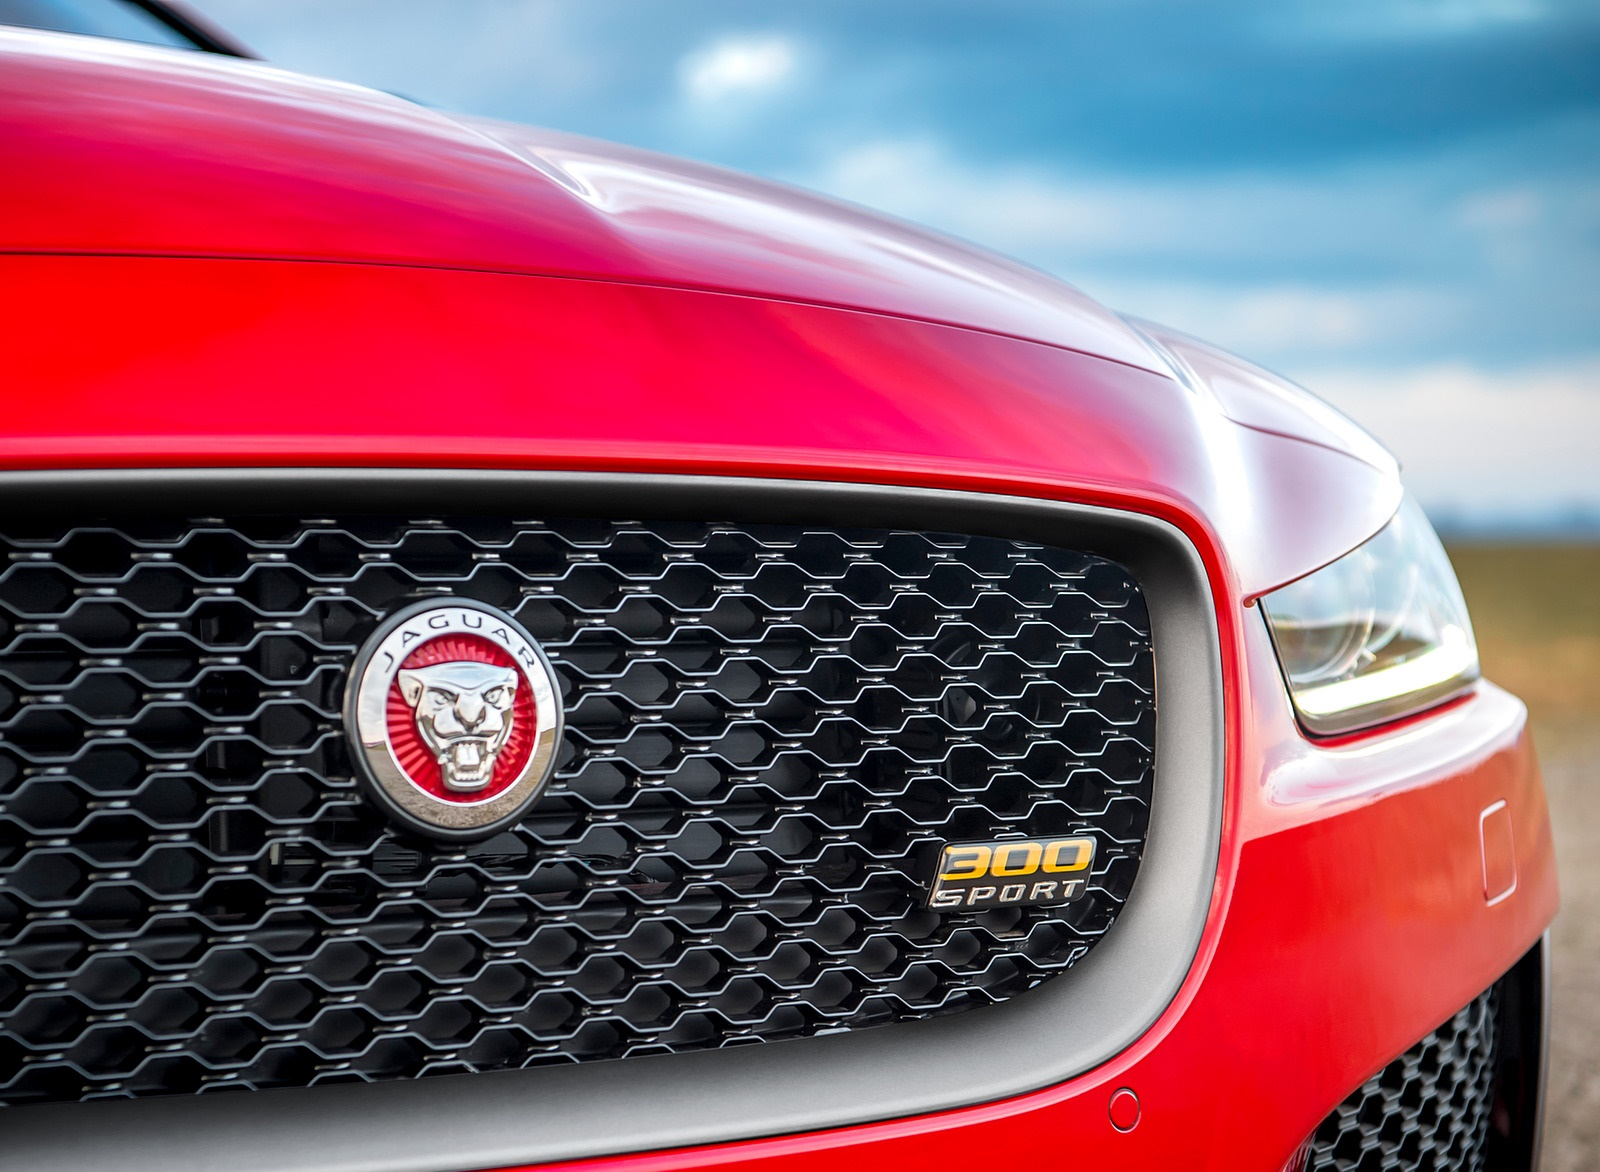 2019 Jaguar XE 300 SPORT Grill Wallpapers (10)